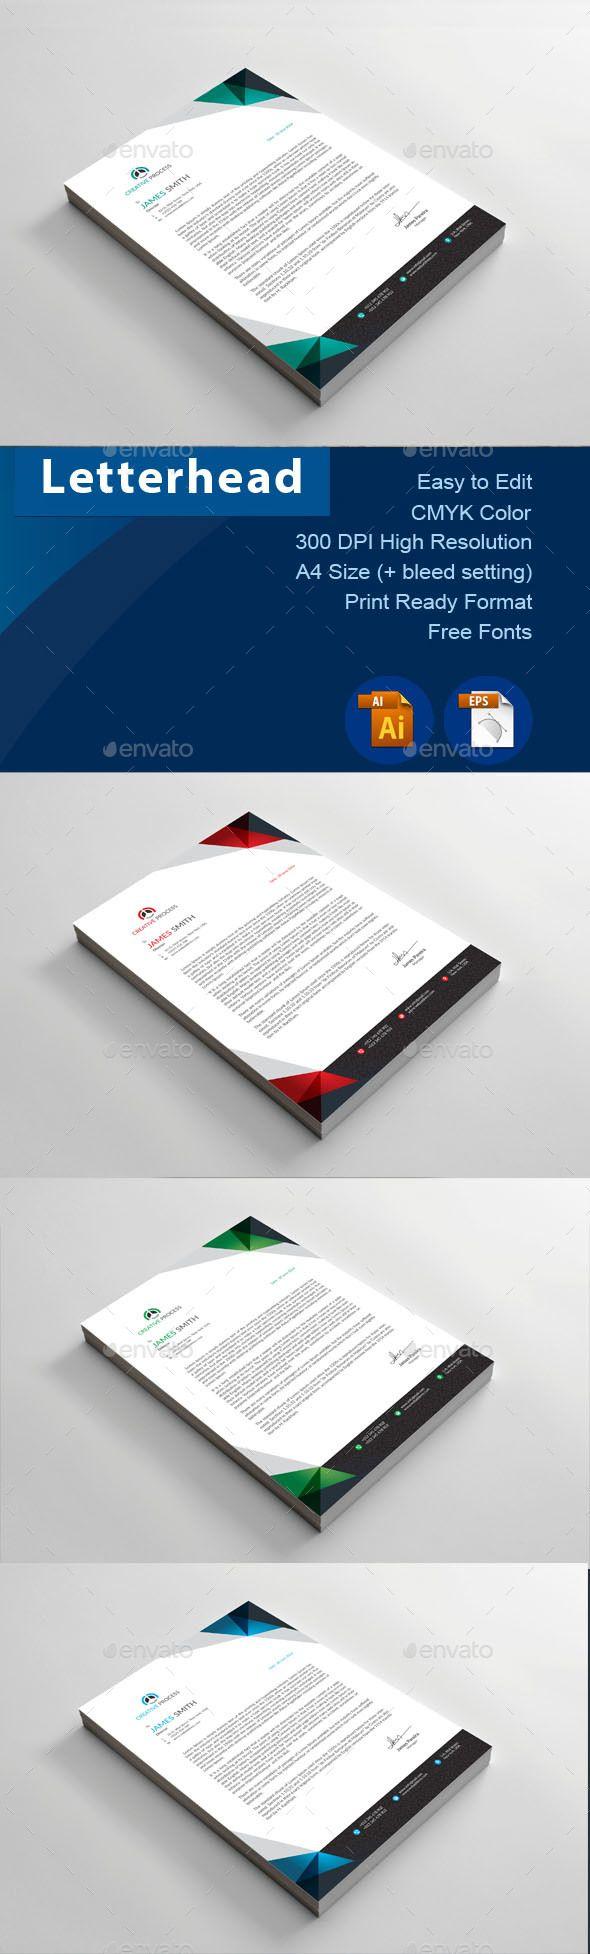 Letterhead - Certificates Stationery Download here: https://graphicriver.net/item/letterhead/19709206?ref=classicdesignp